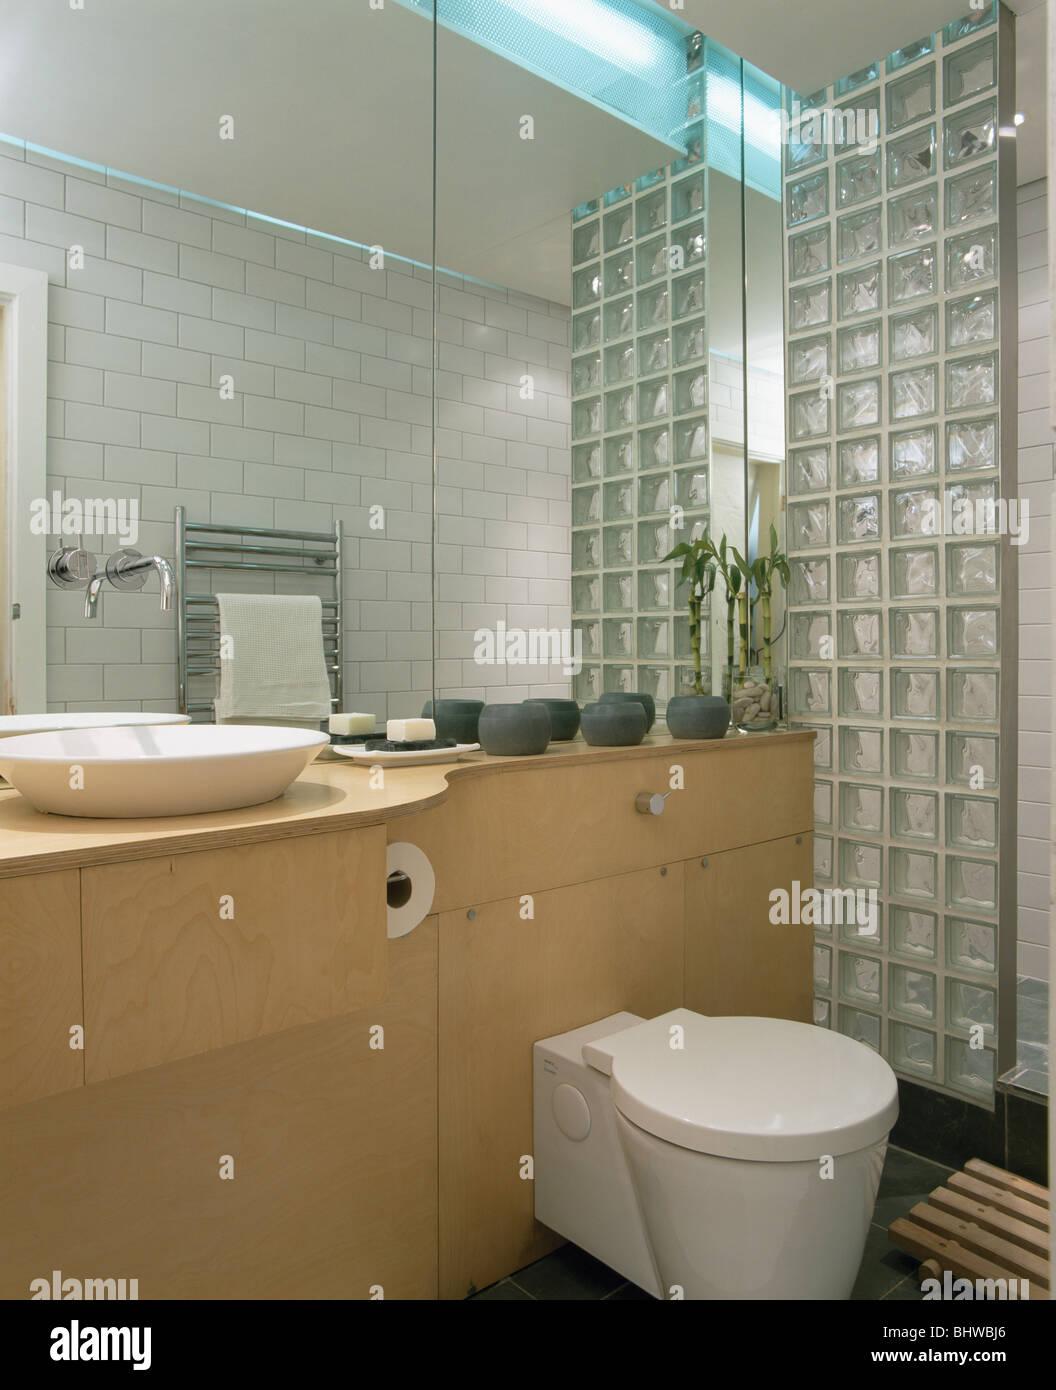 Glass bricks in bathroom - Glass Brick Wall In Modern Bathroom With Mirrored Wall Above Vanity Unit